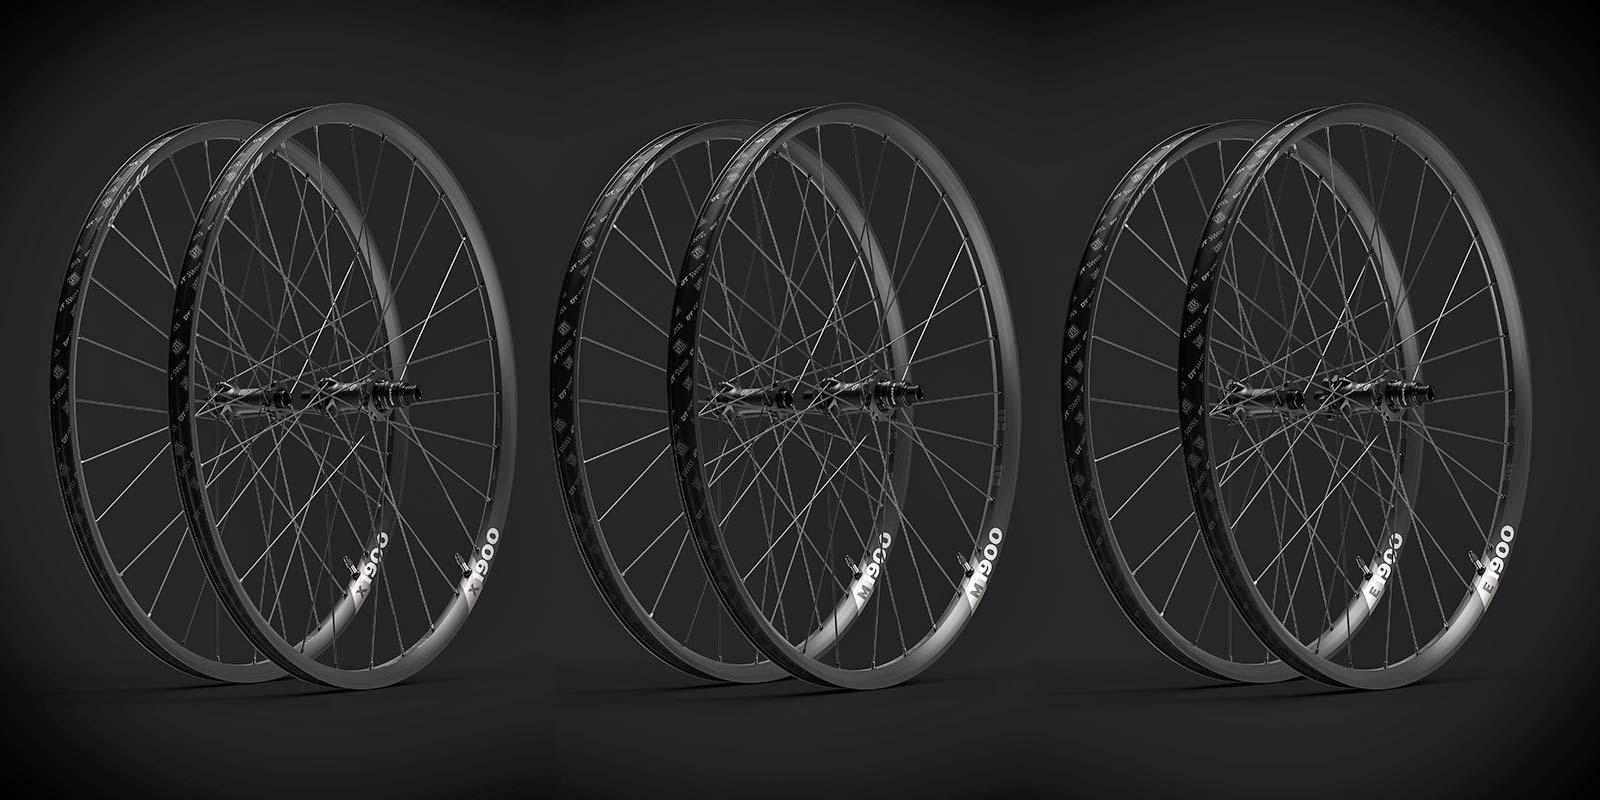 DT Swiss 1900 Spline MTB wheels upgrade to Ratchet LN hubs, family